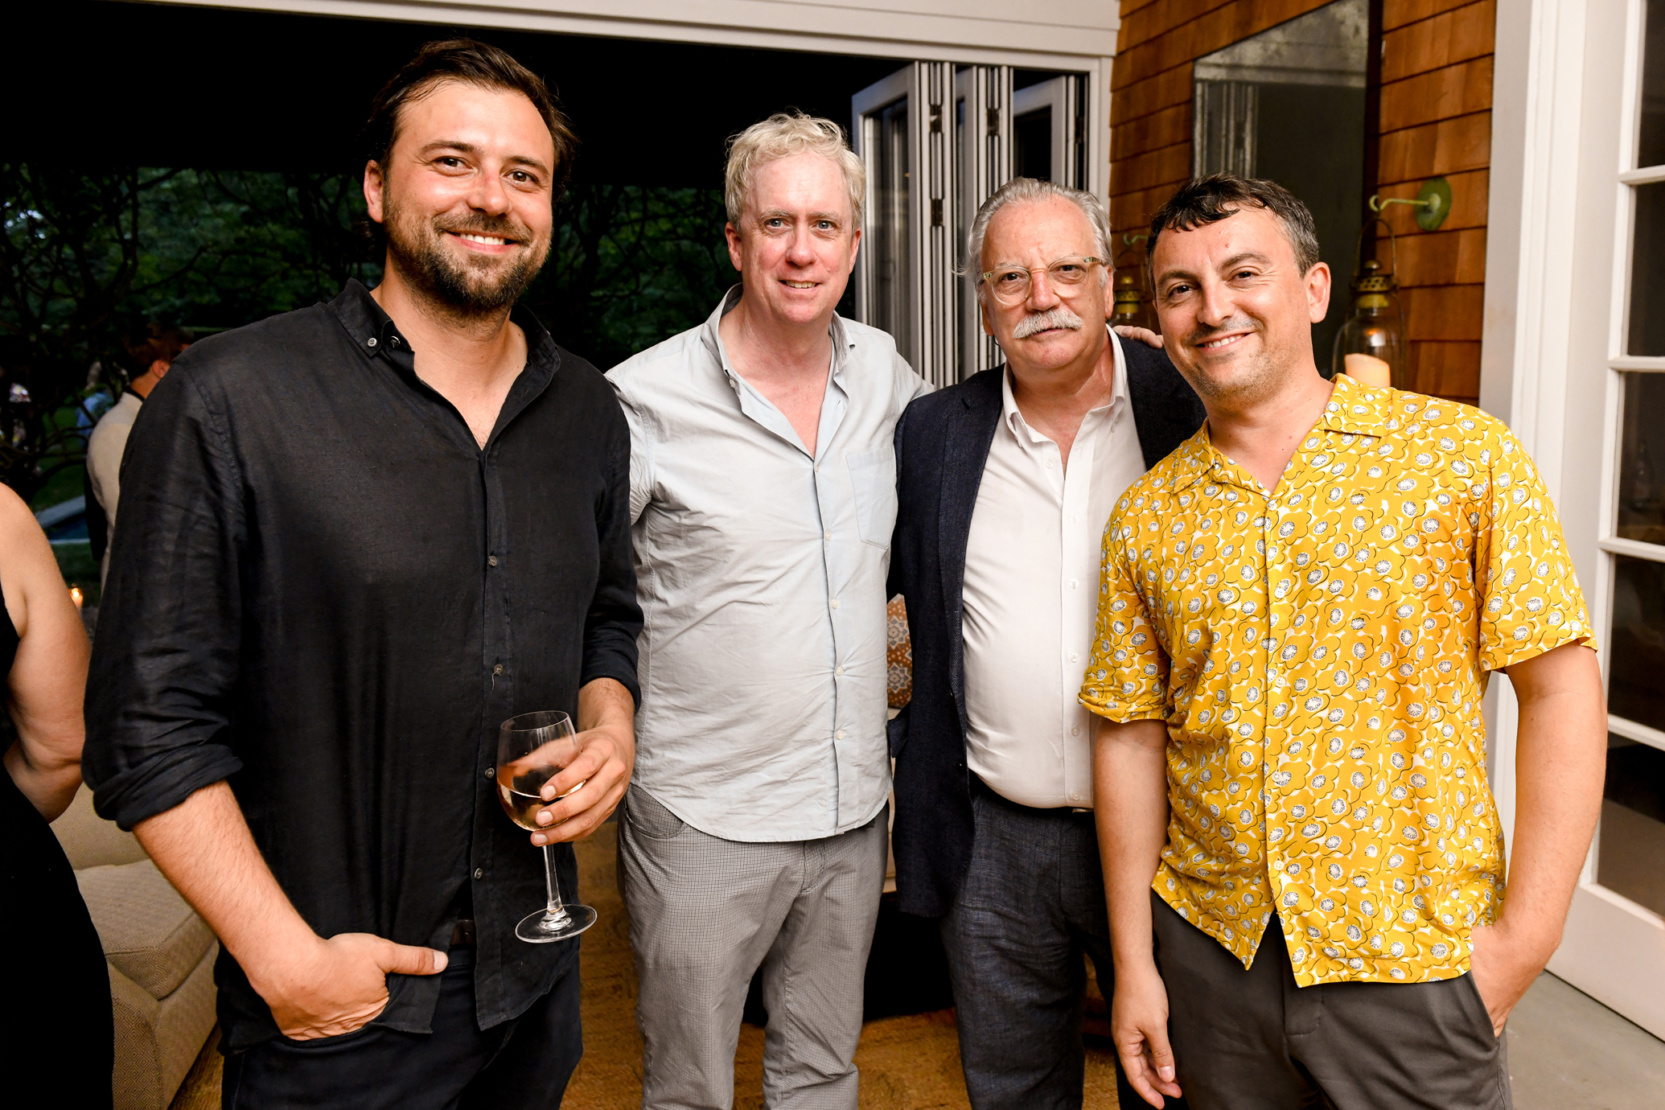 Tony Oursler, Moses Perez and Santiago Giralda